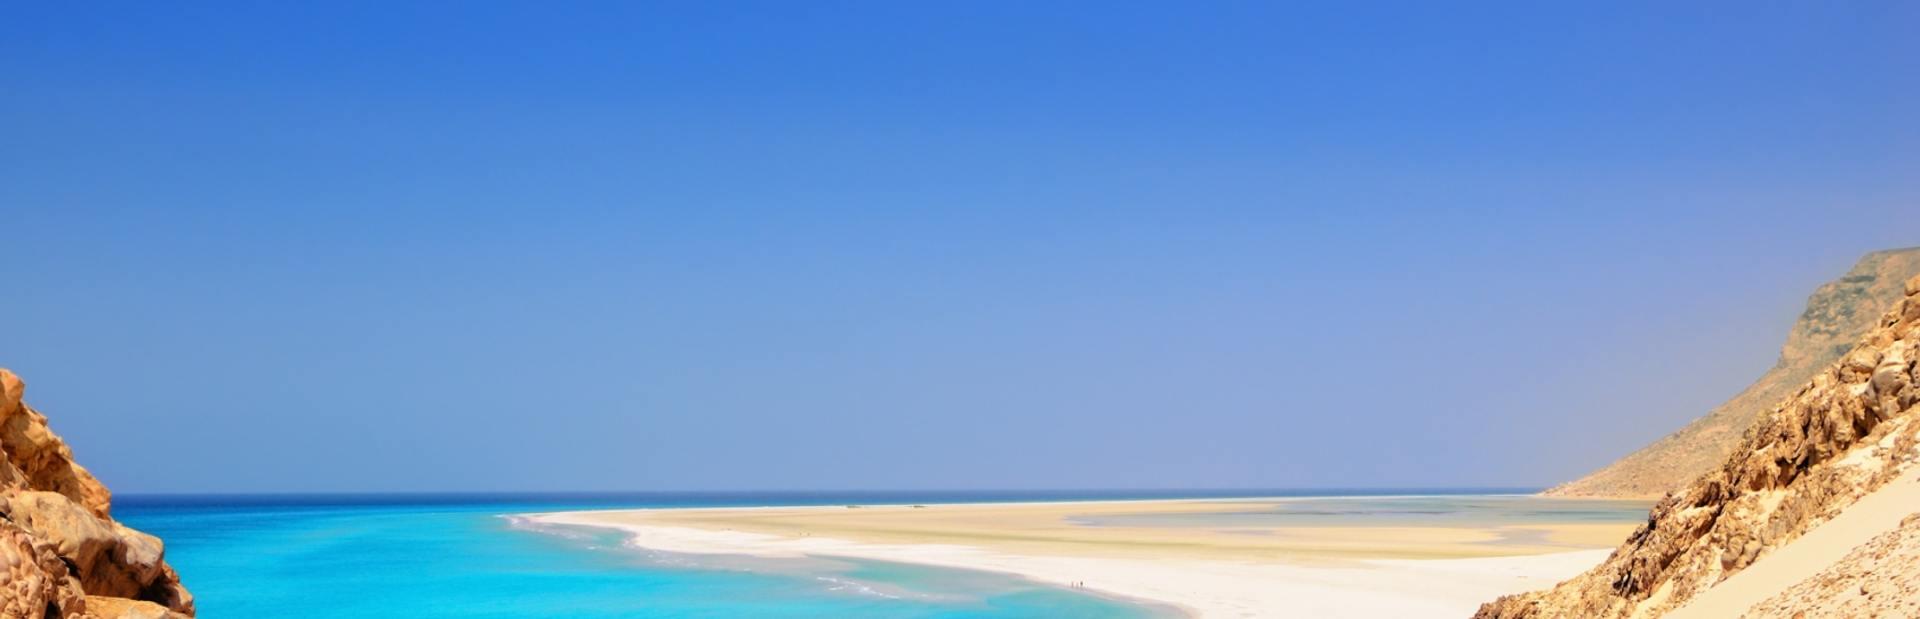 Socotra photo tour